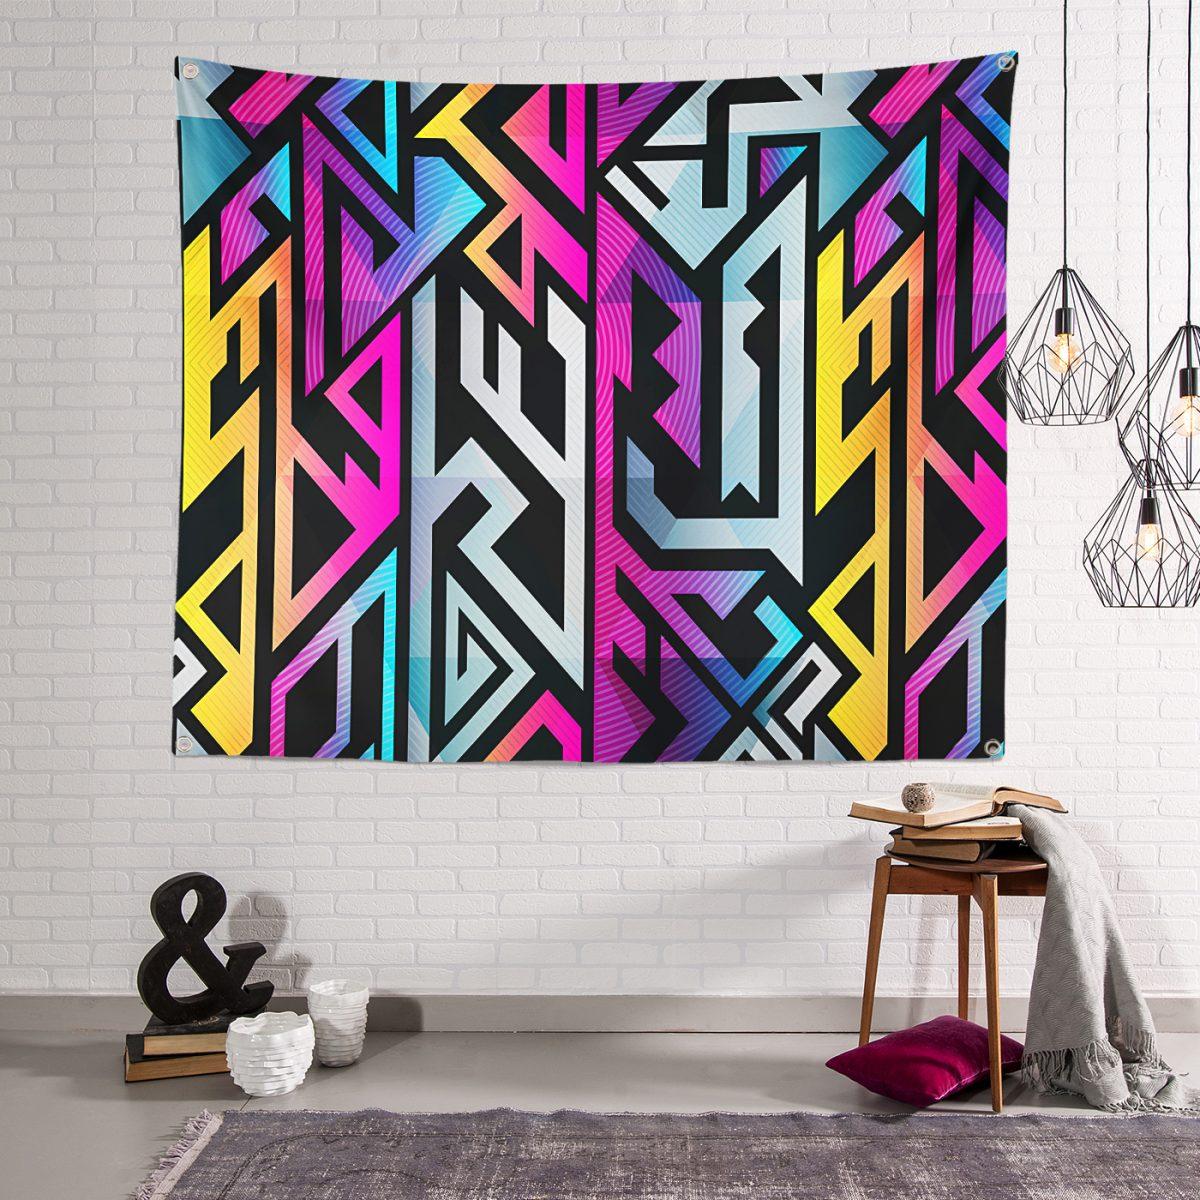 RealHomes Moda Özel Tasarım Dijital Baskılı Modern Tapestry Duvar Örtüsü Realhomes